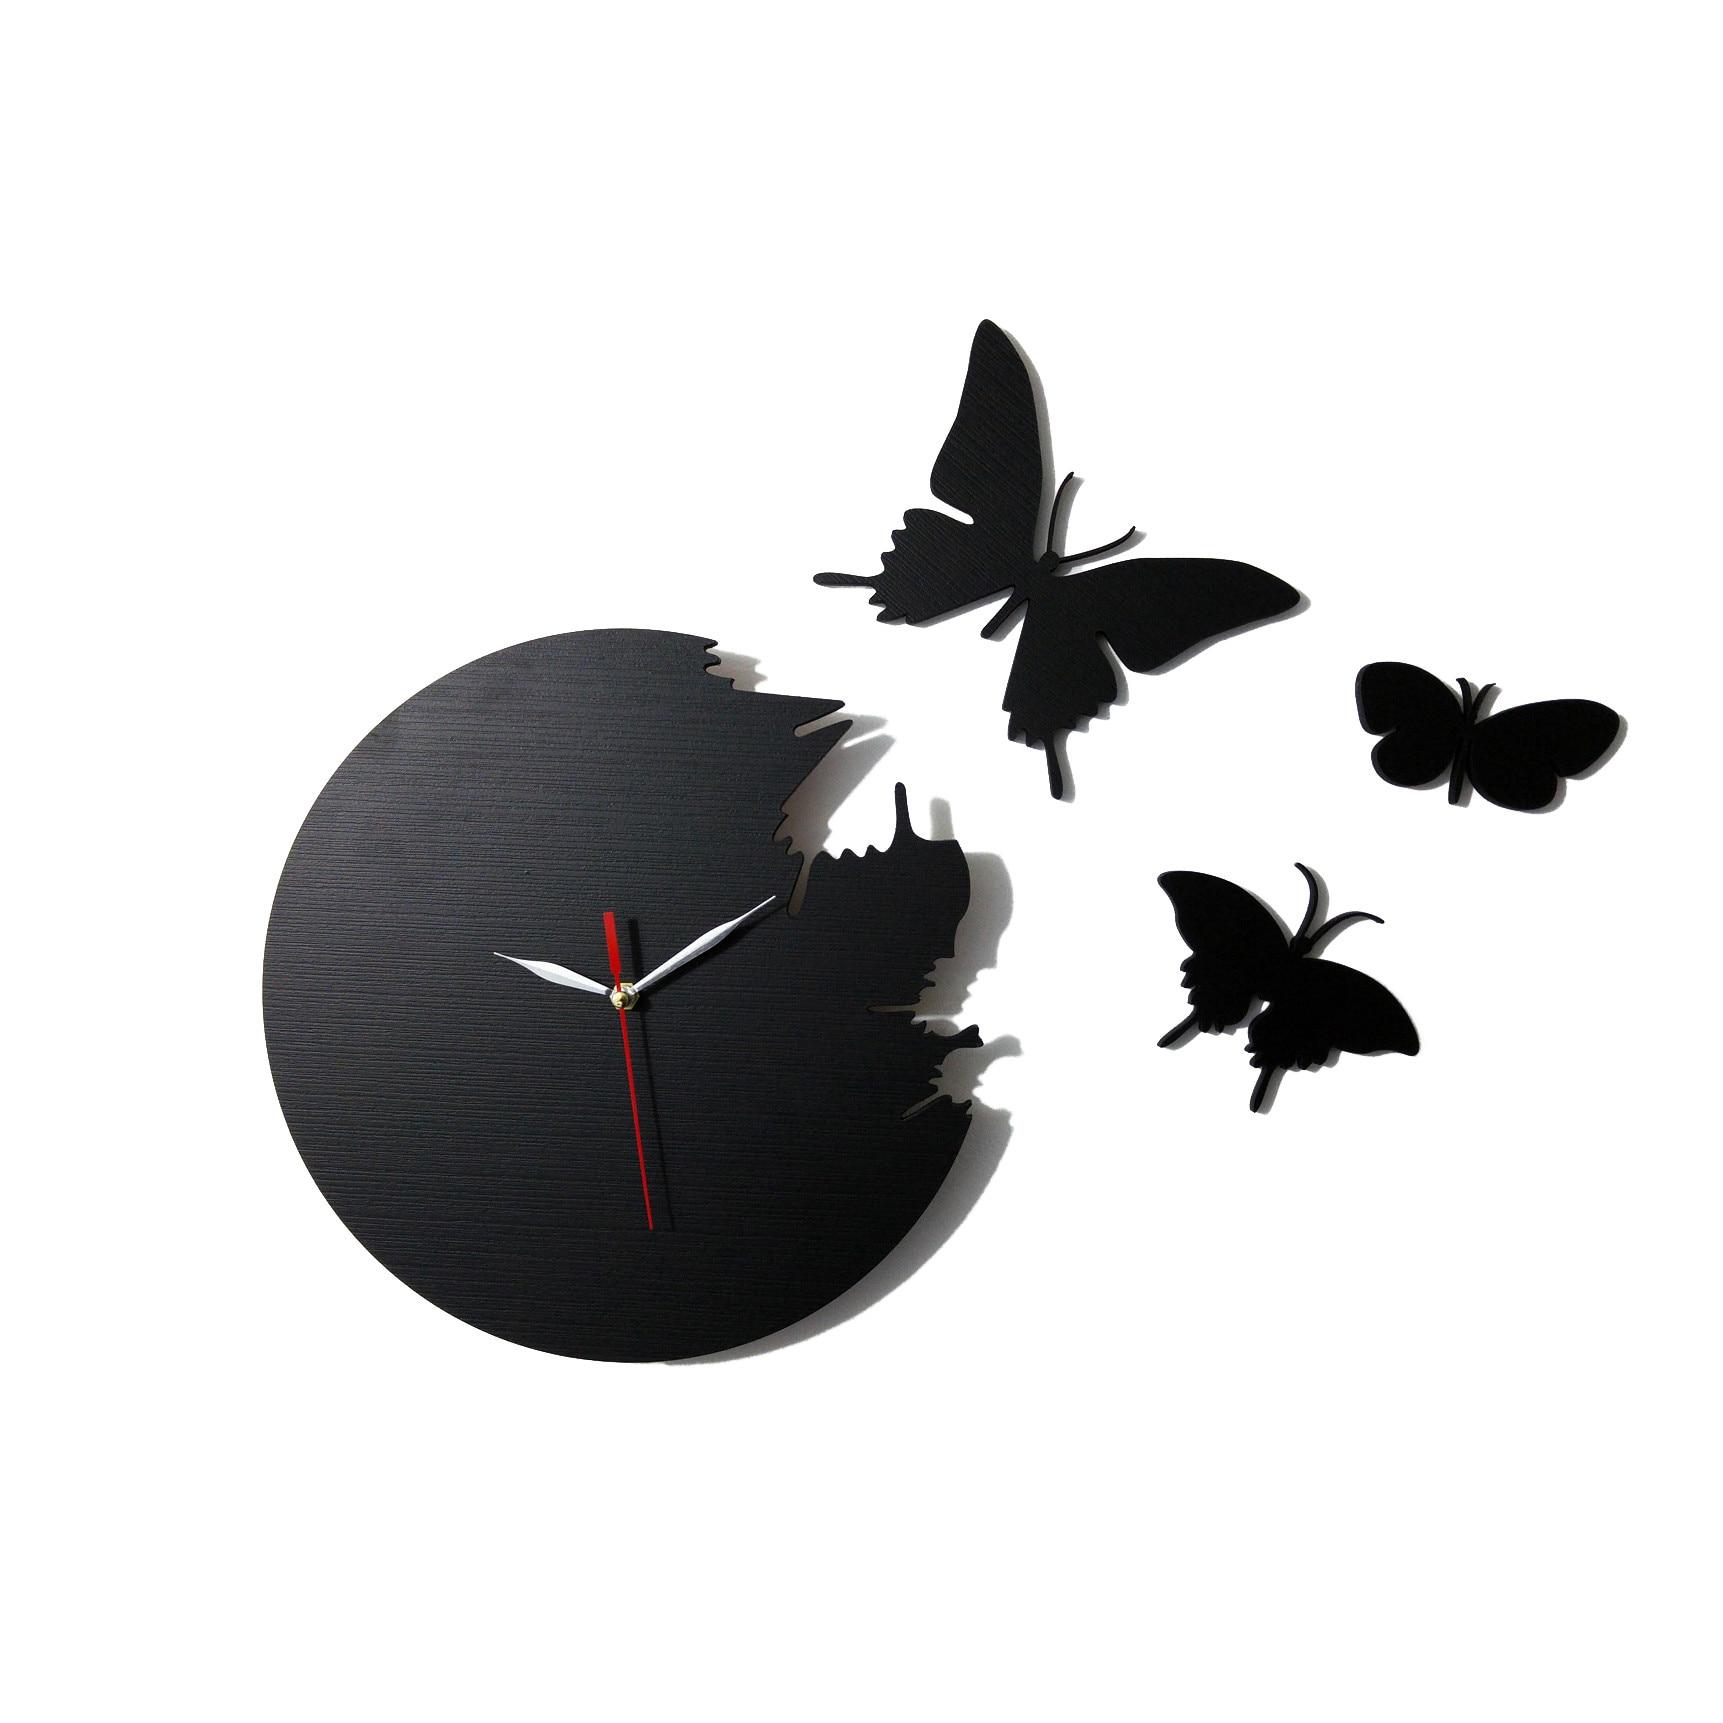 de perete cu fluturi exteriori Negru 28 cm